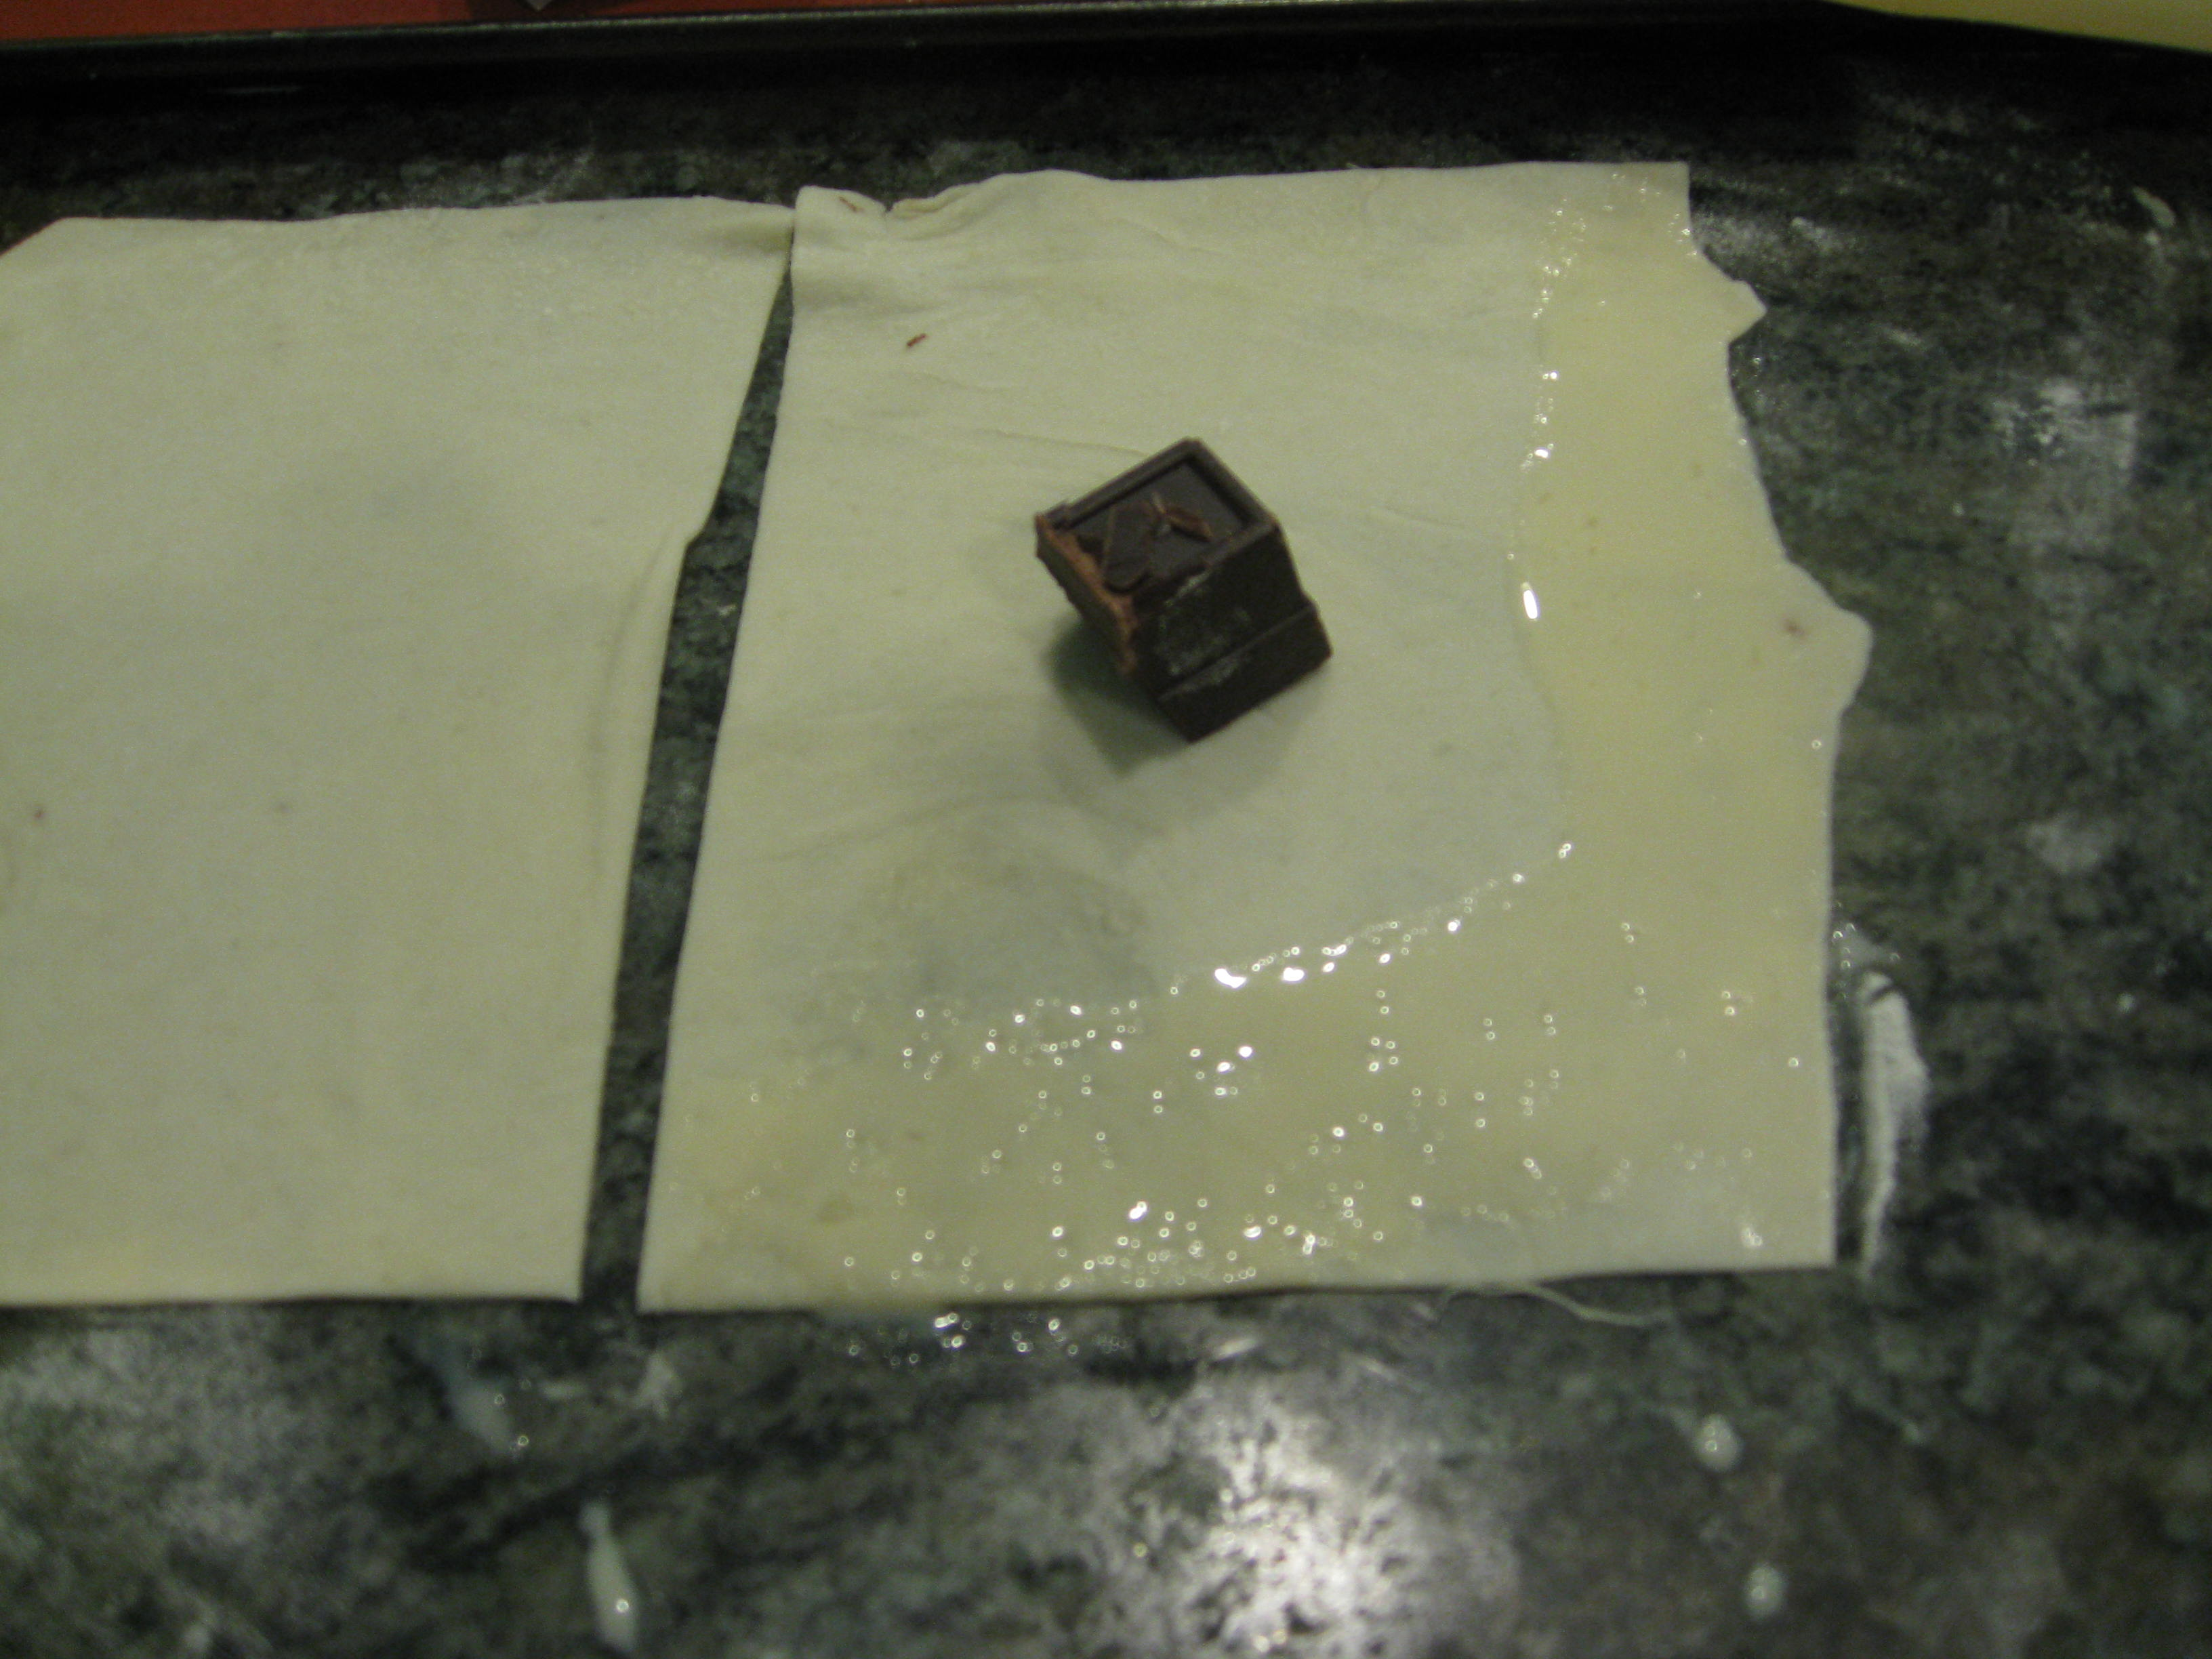 Add chocolate and brush edges